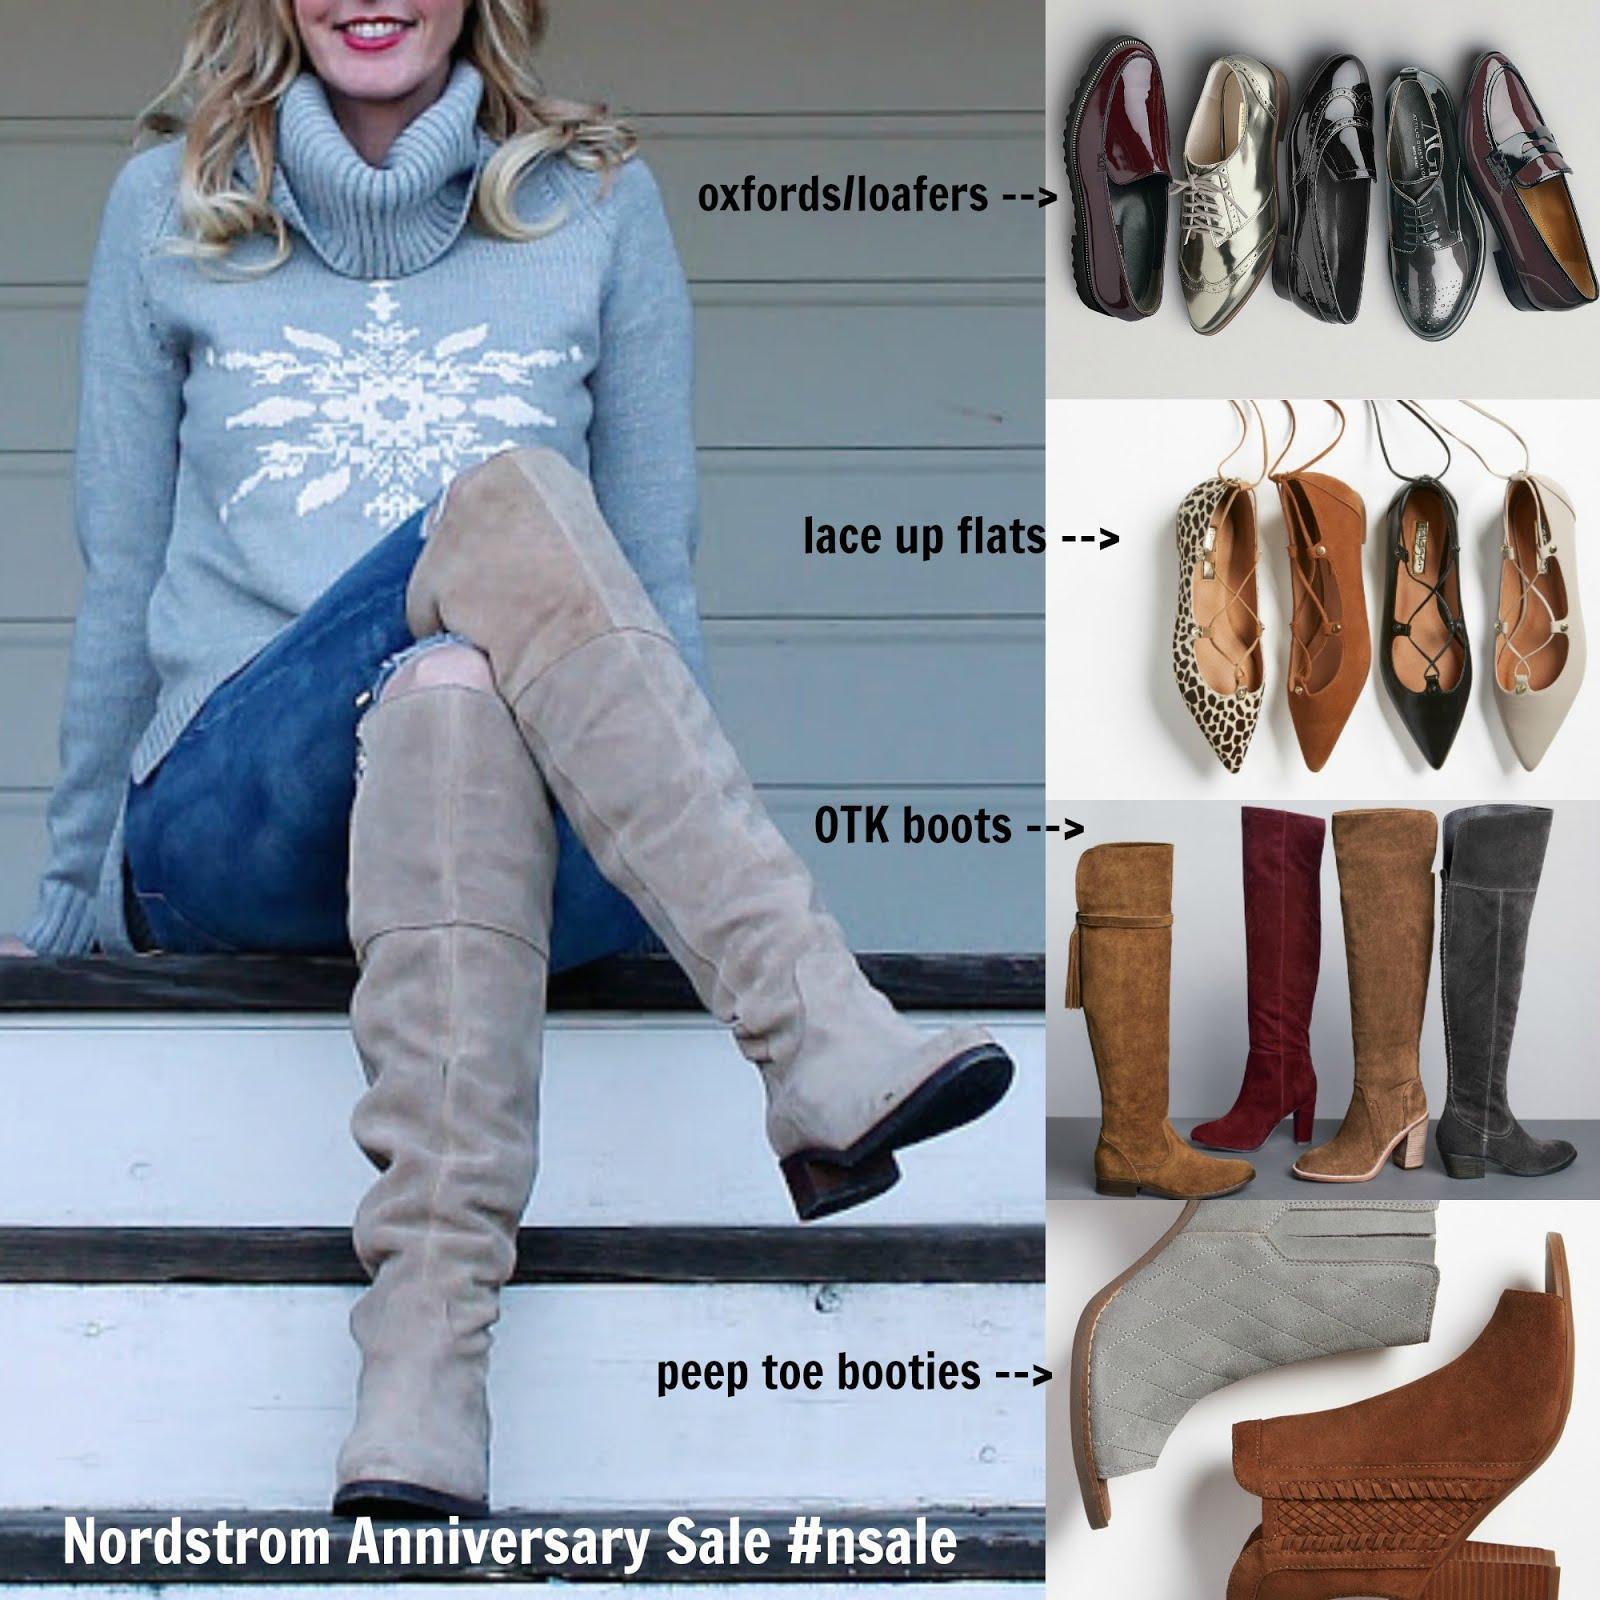 Nordstrom Anniversary Sale: Women's Shoes: My Picks